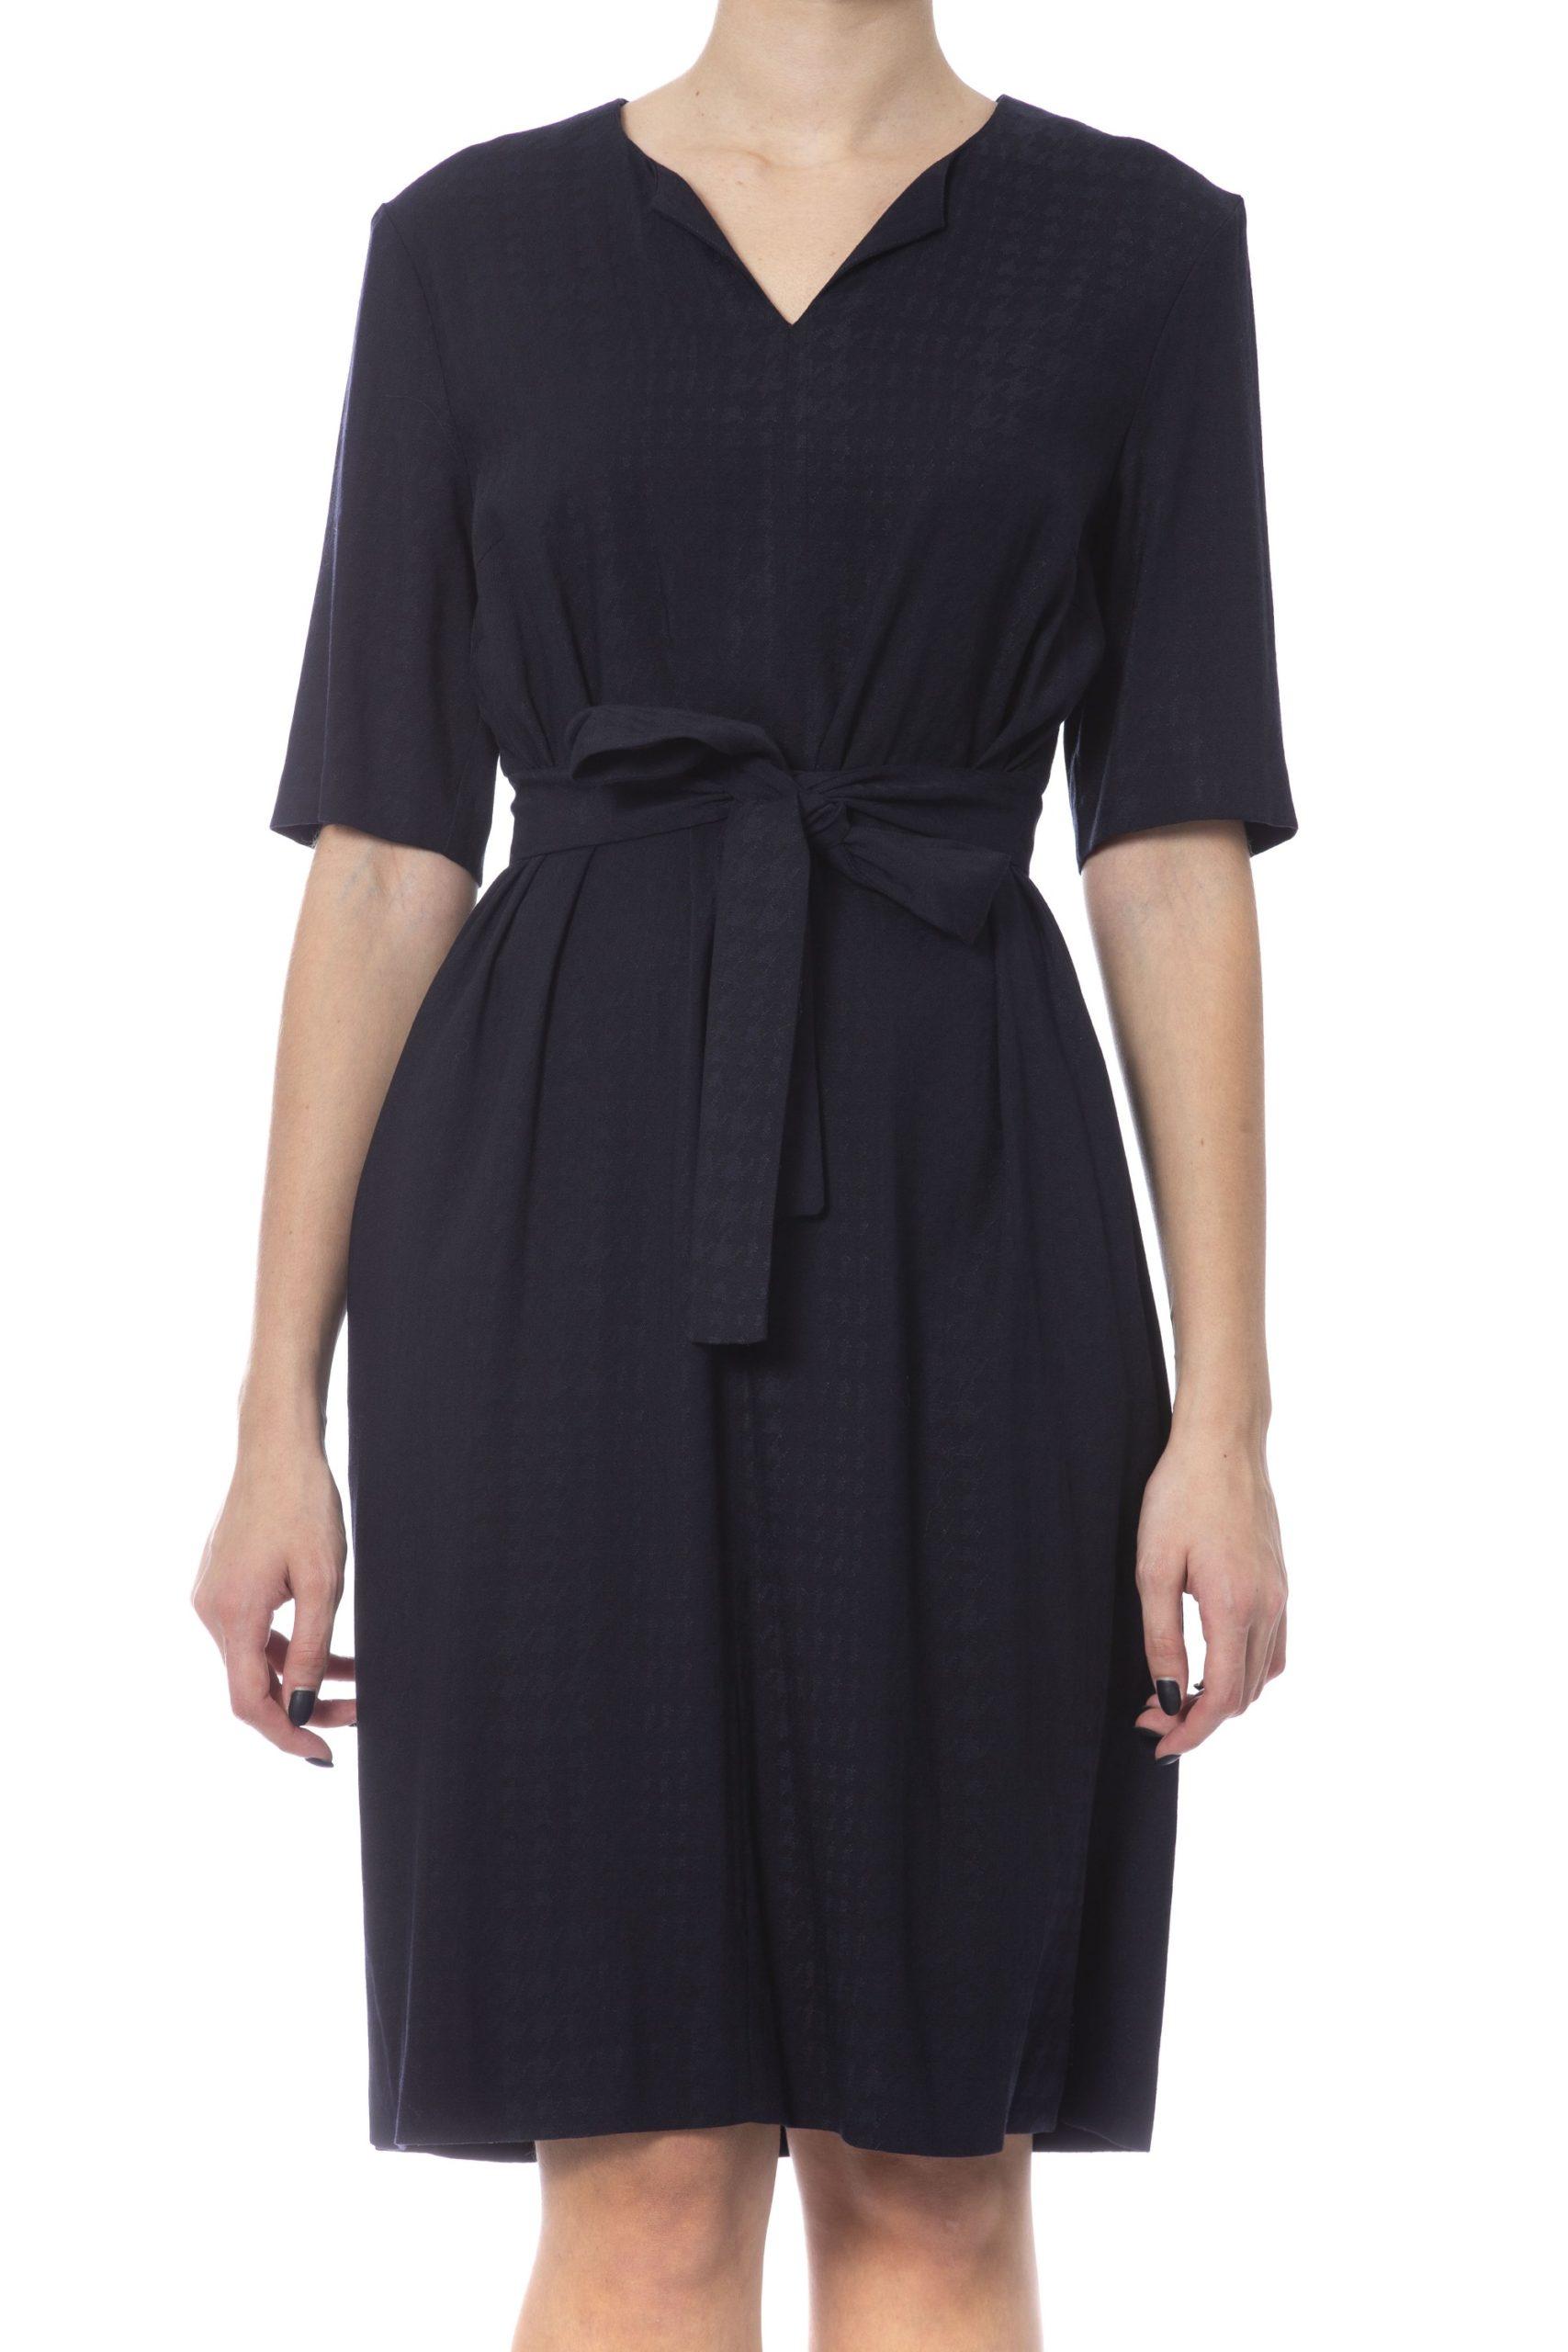 Peserico Women's Dress Blue PE992544 - IT42 | S